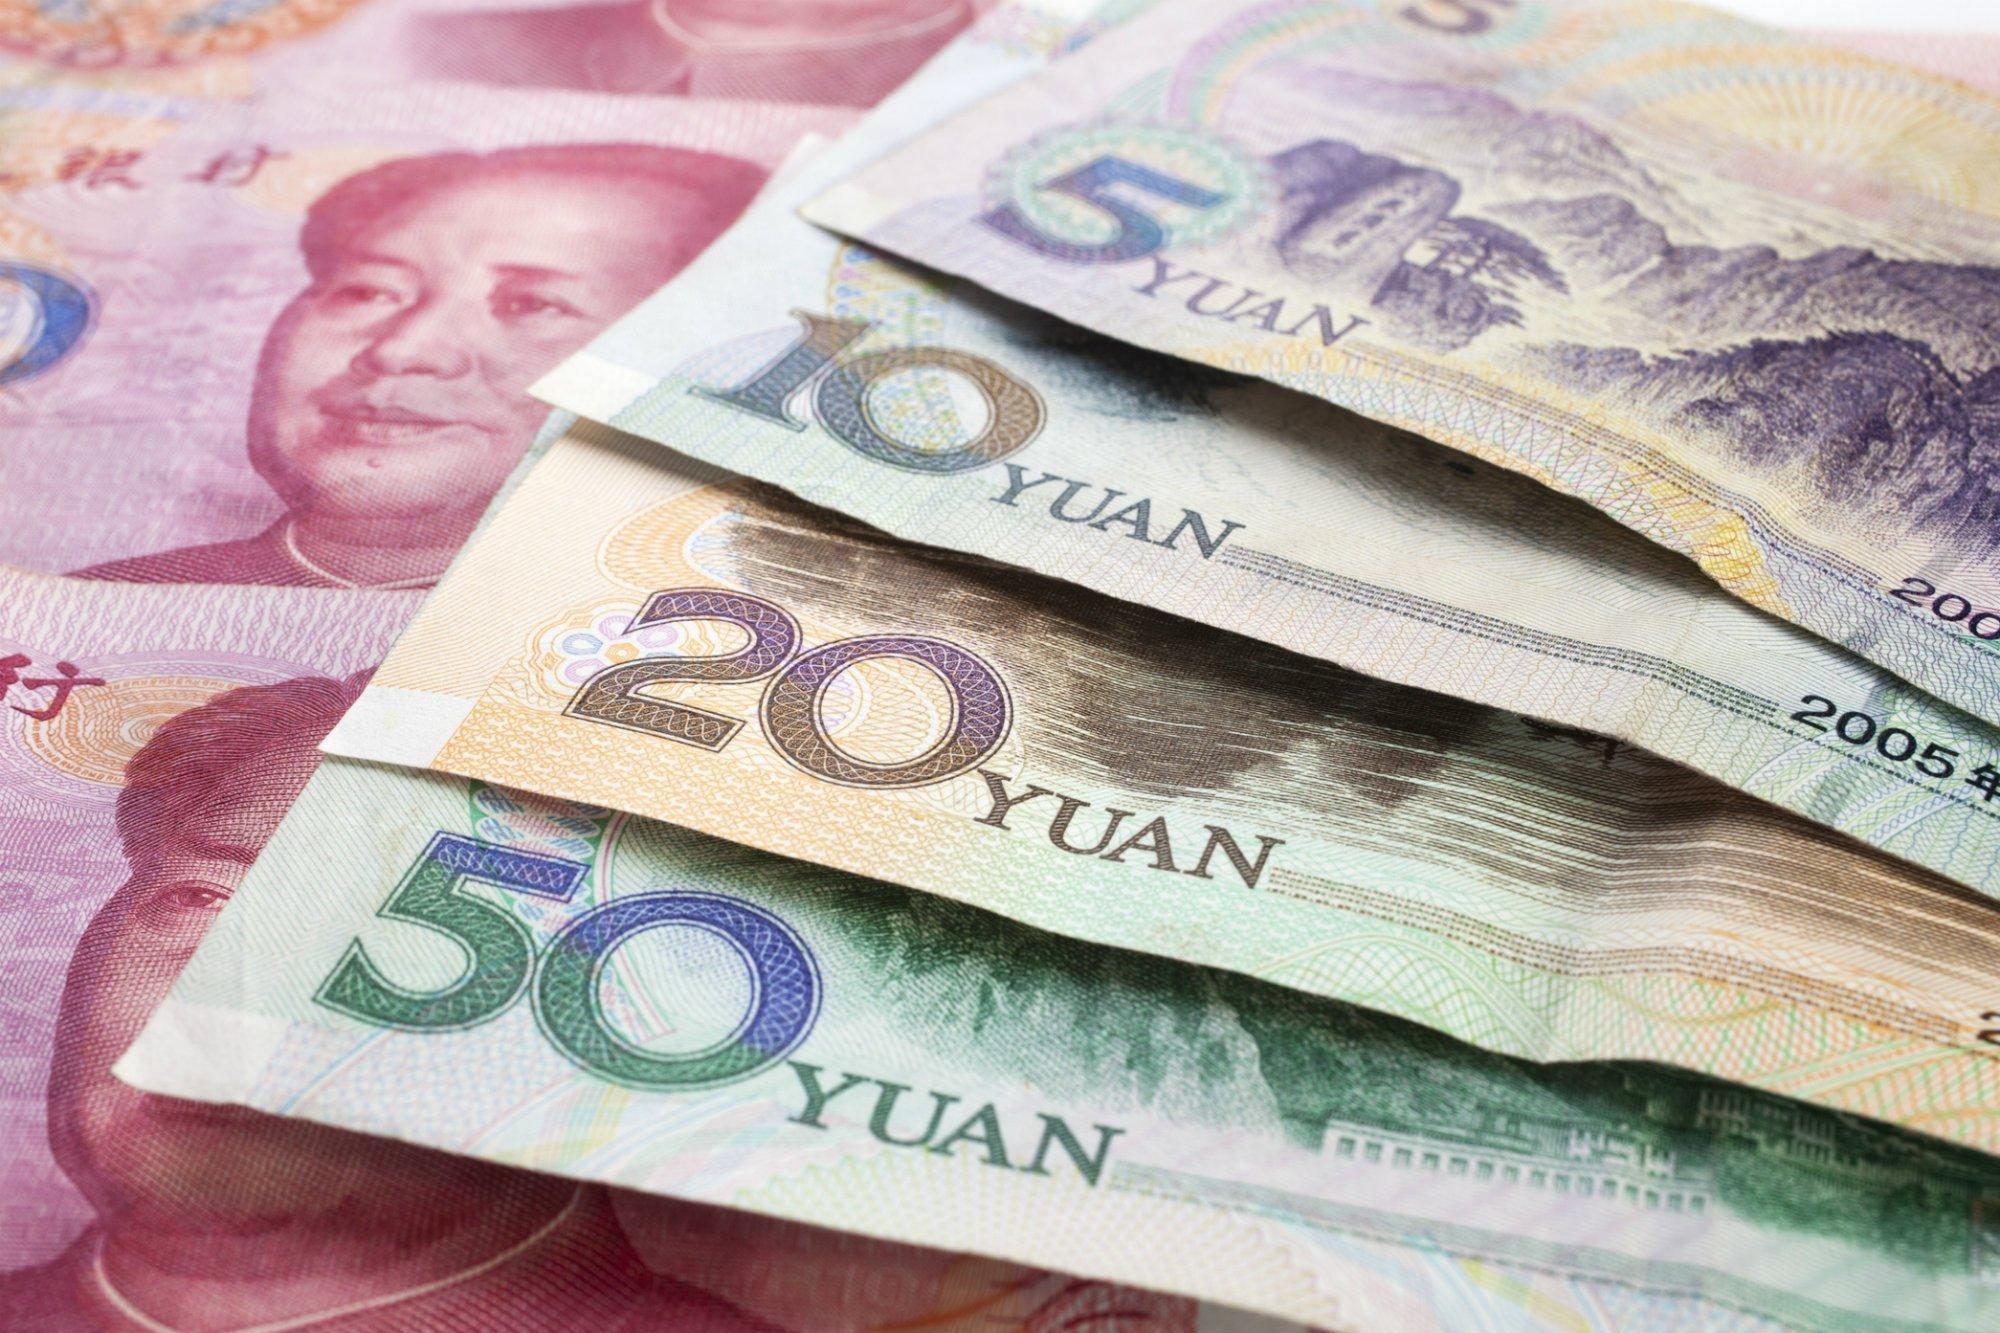 Tin-nong-tai-chinh-dau-ngay-TraderViet1.